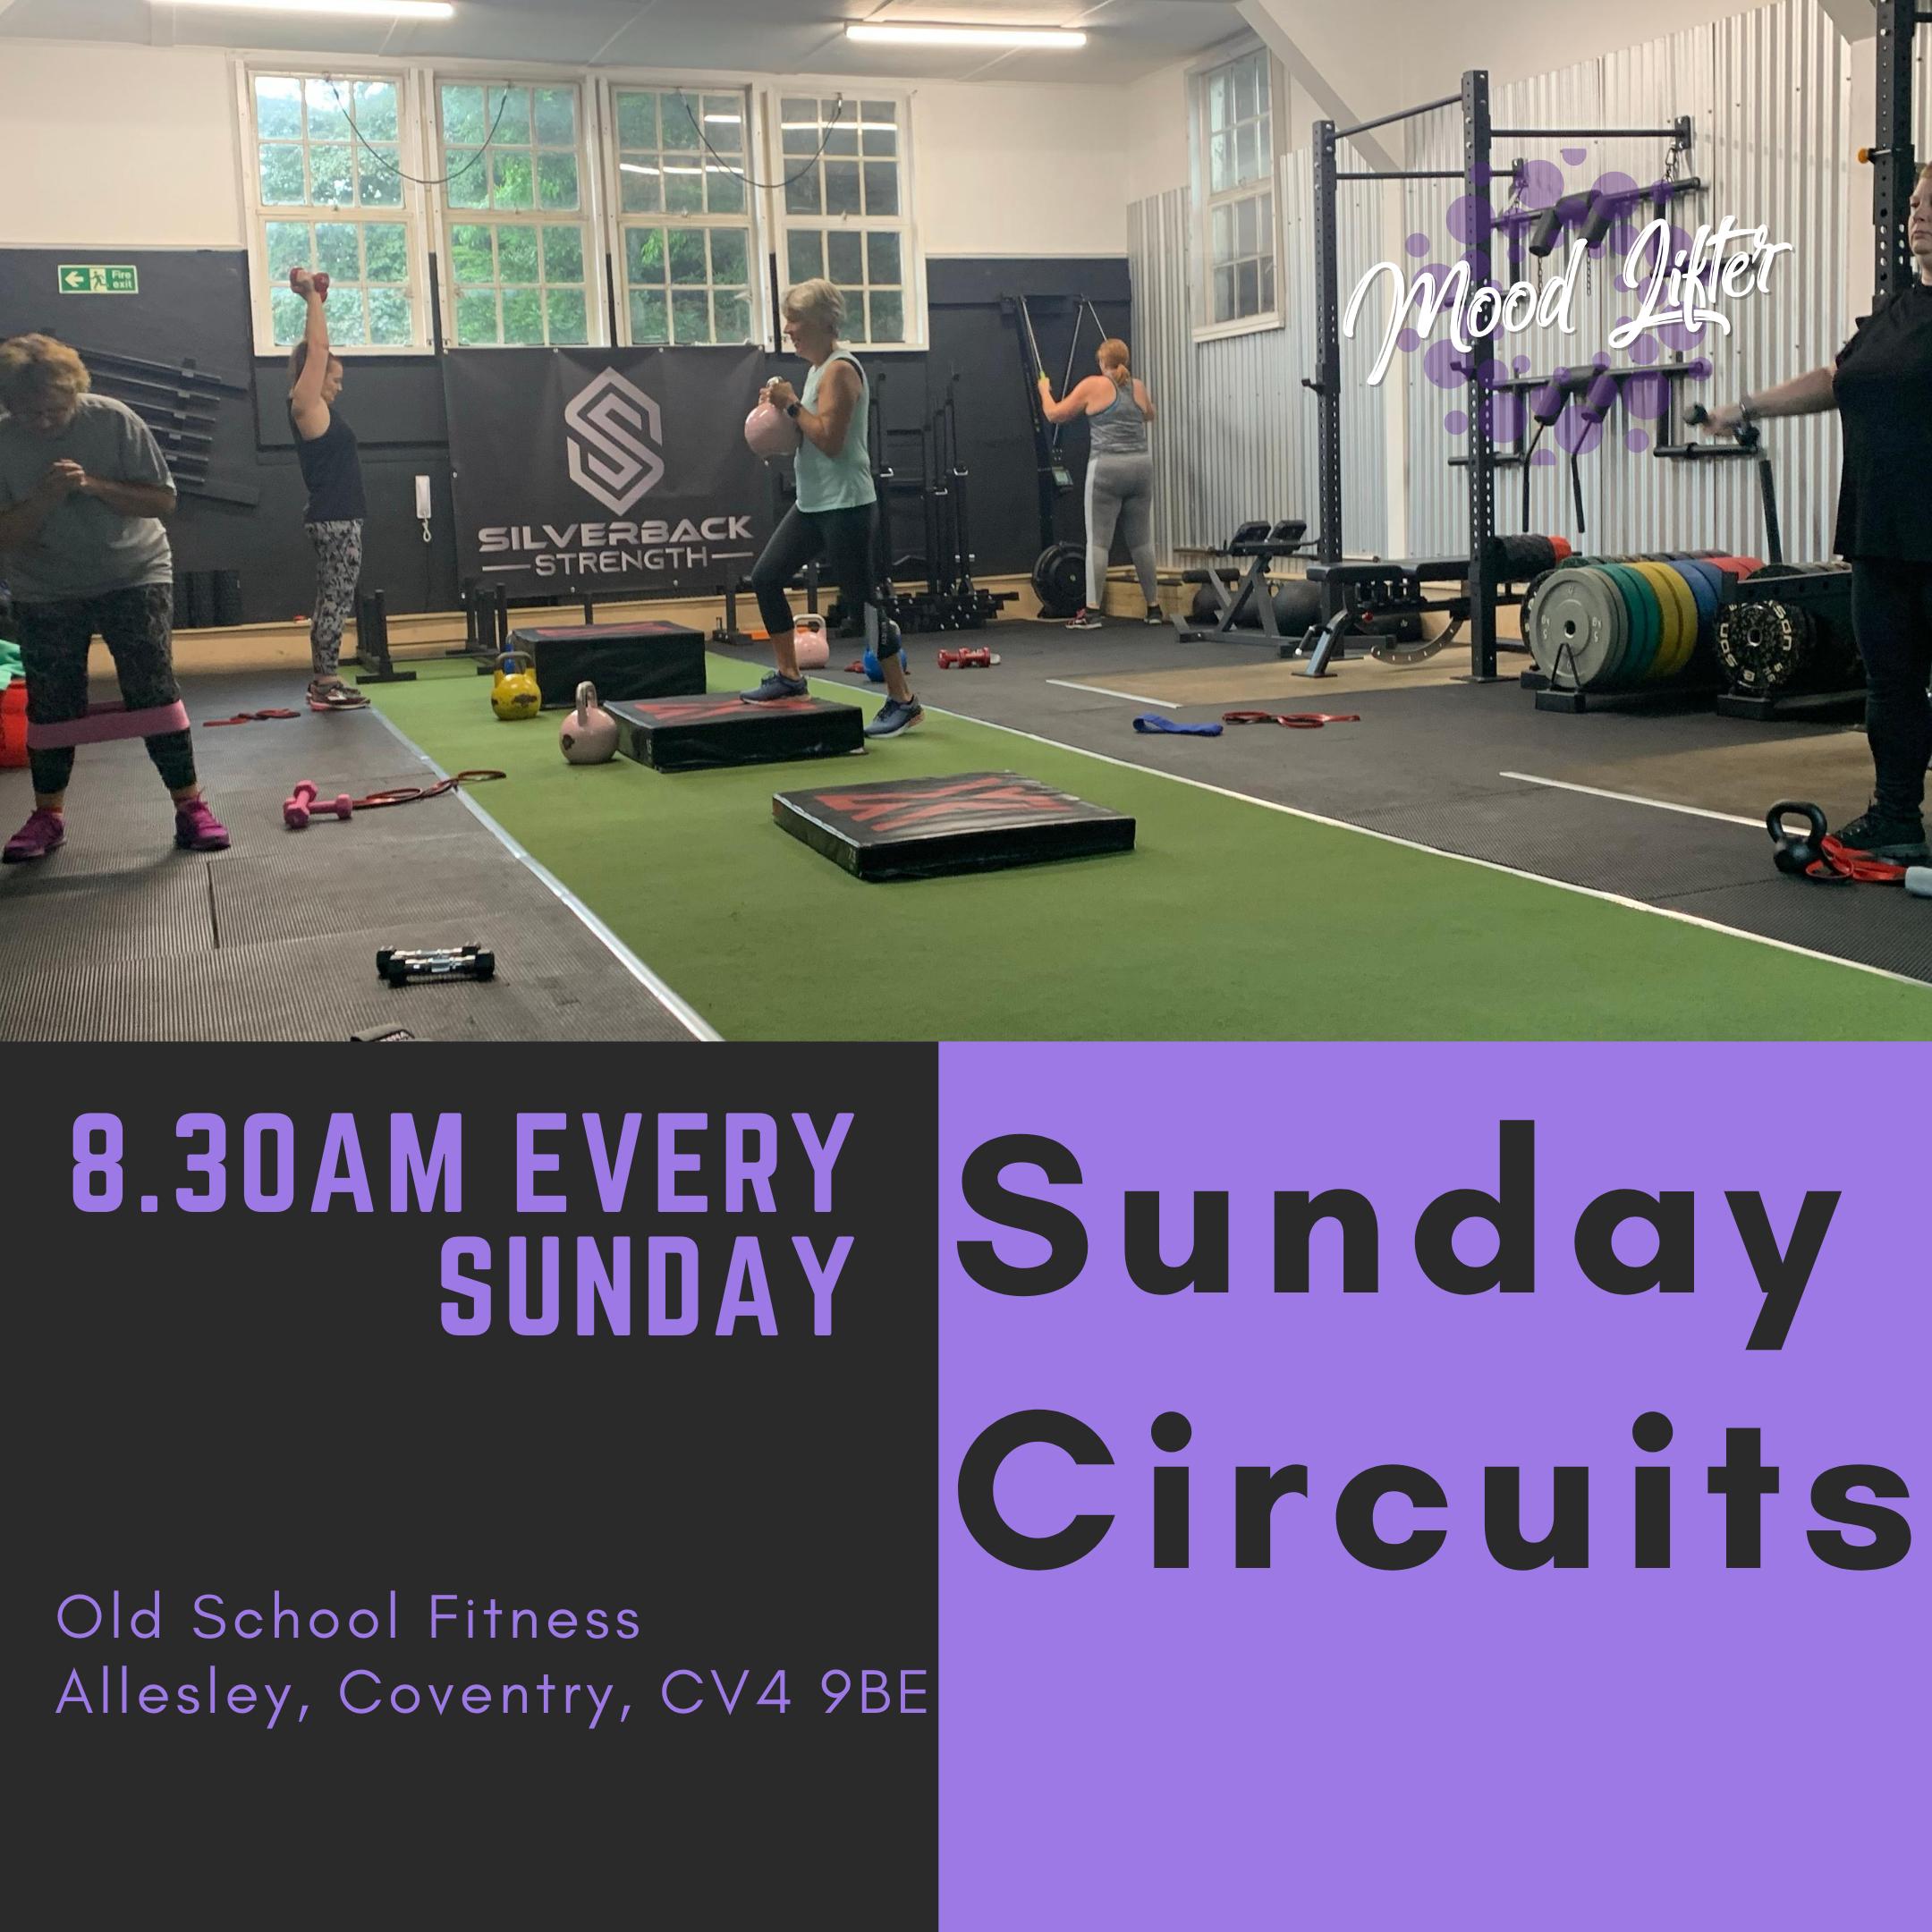 Sunday Circuits